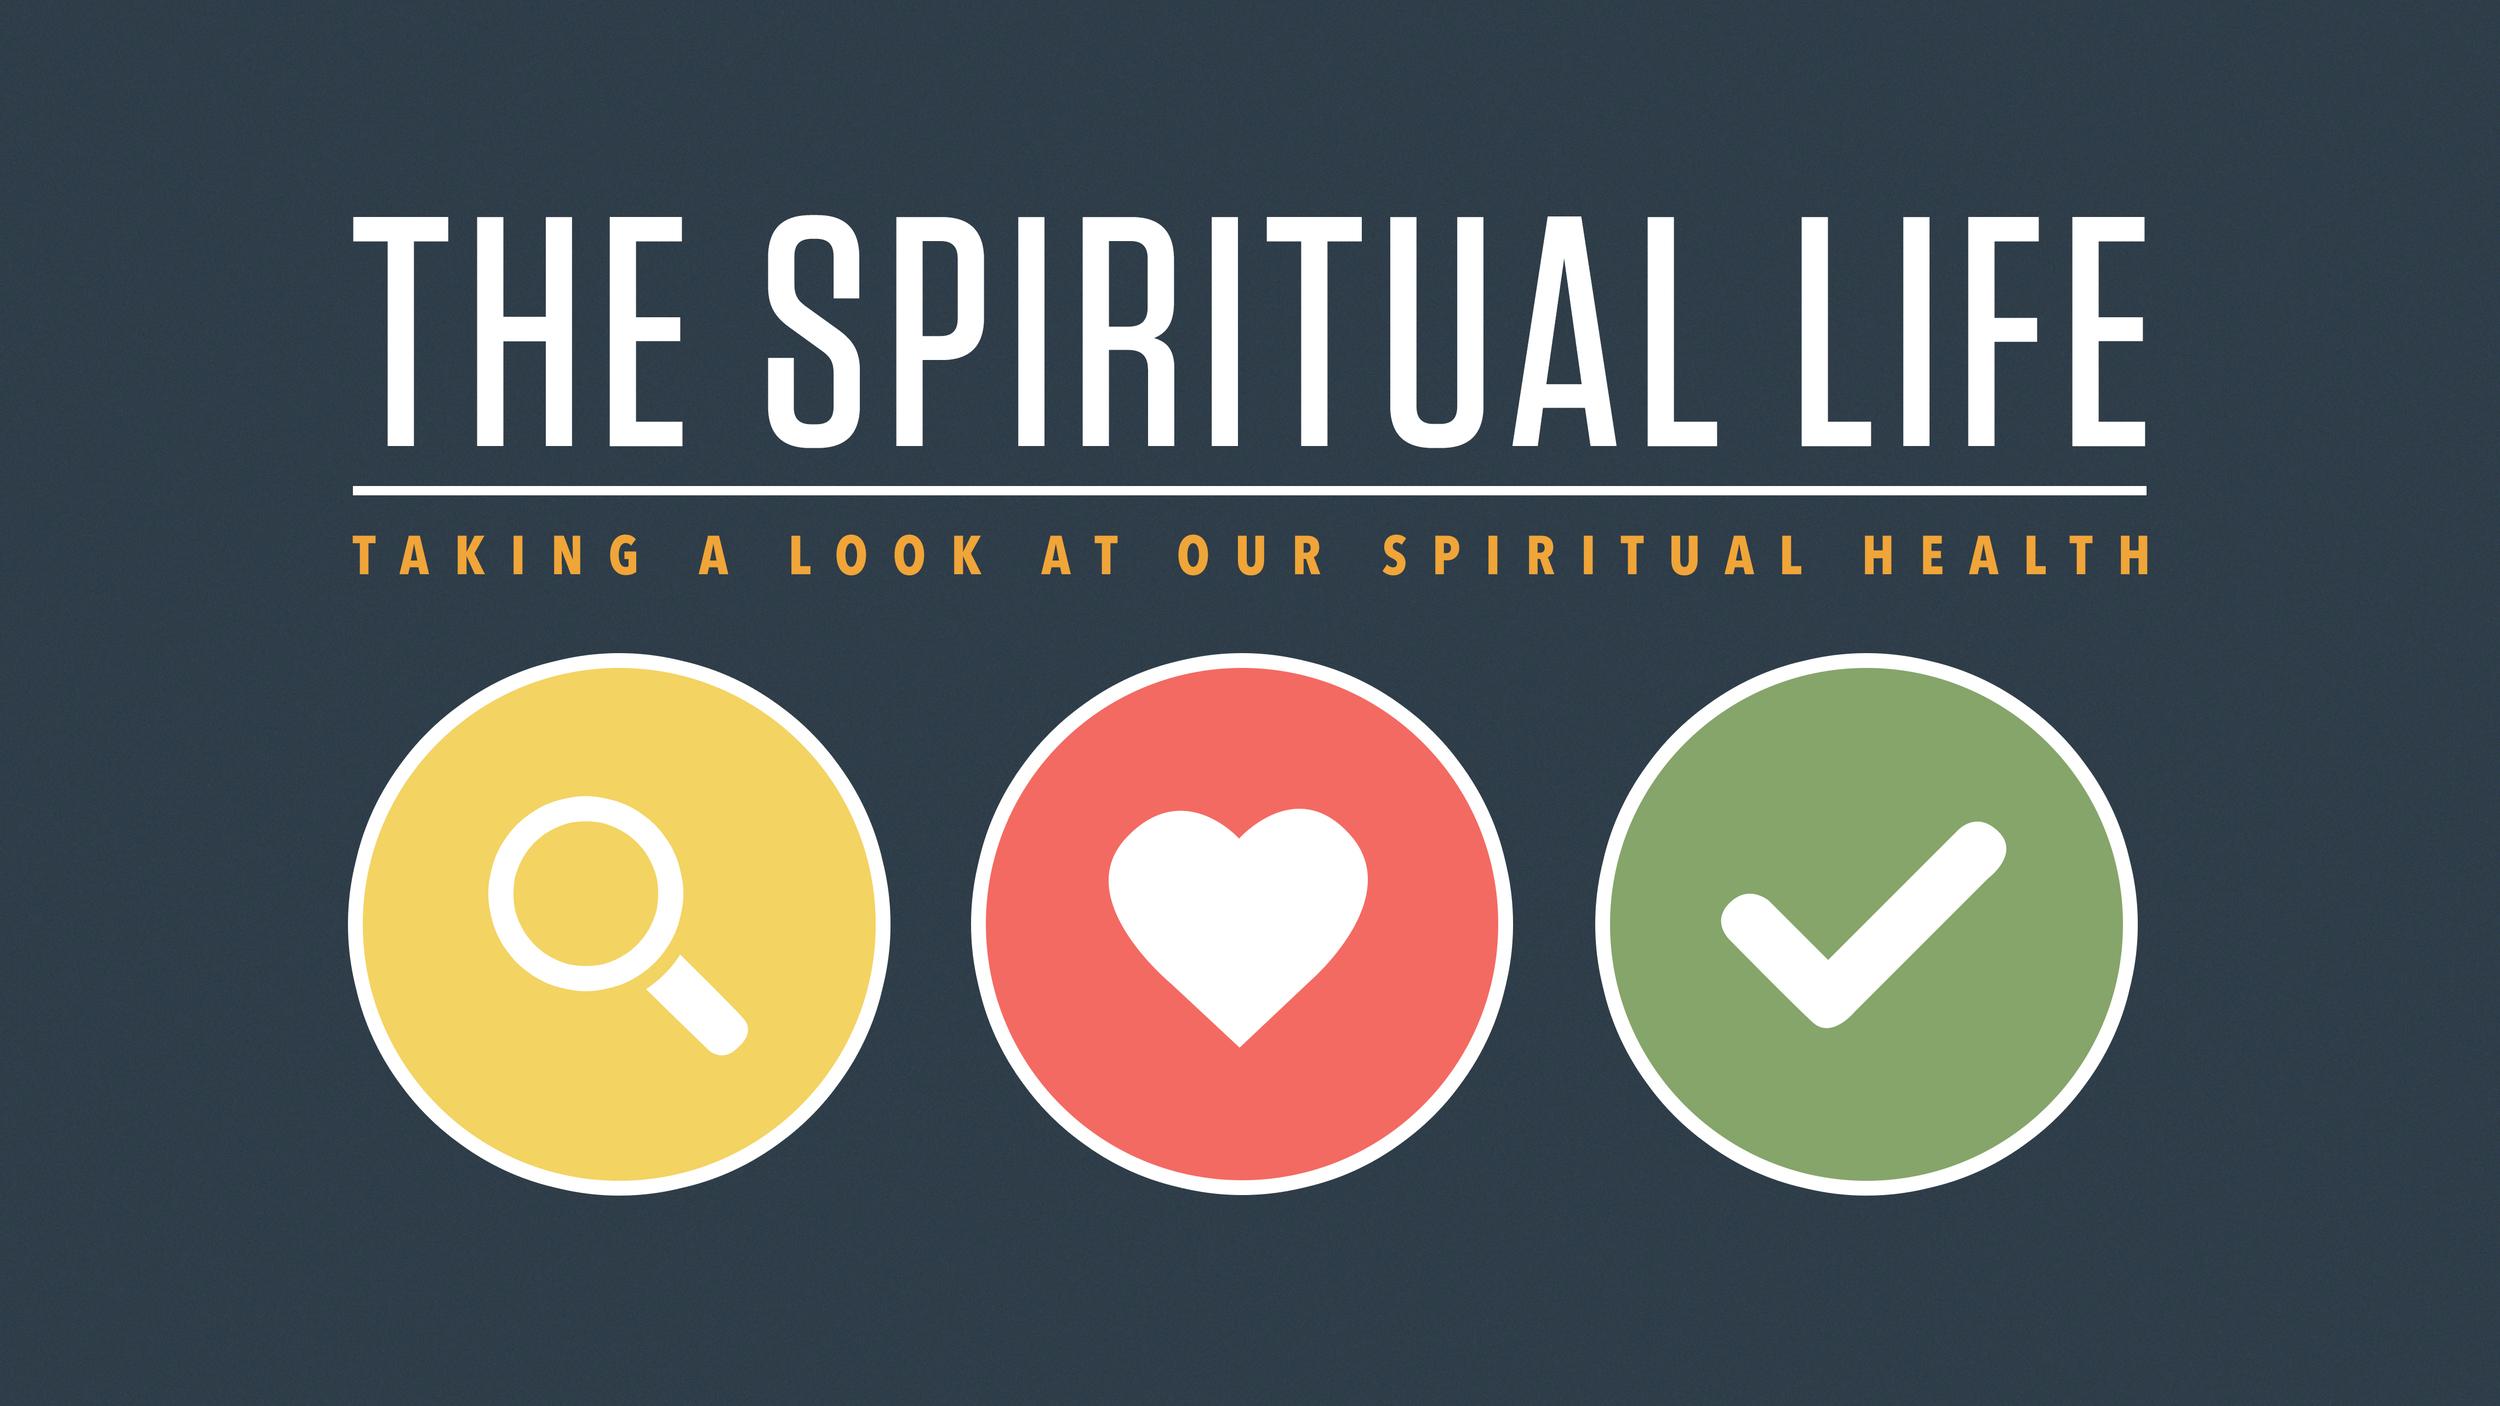 The Spiritual Life - Full.jpg